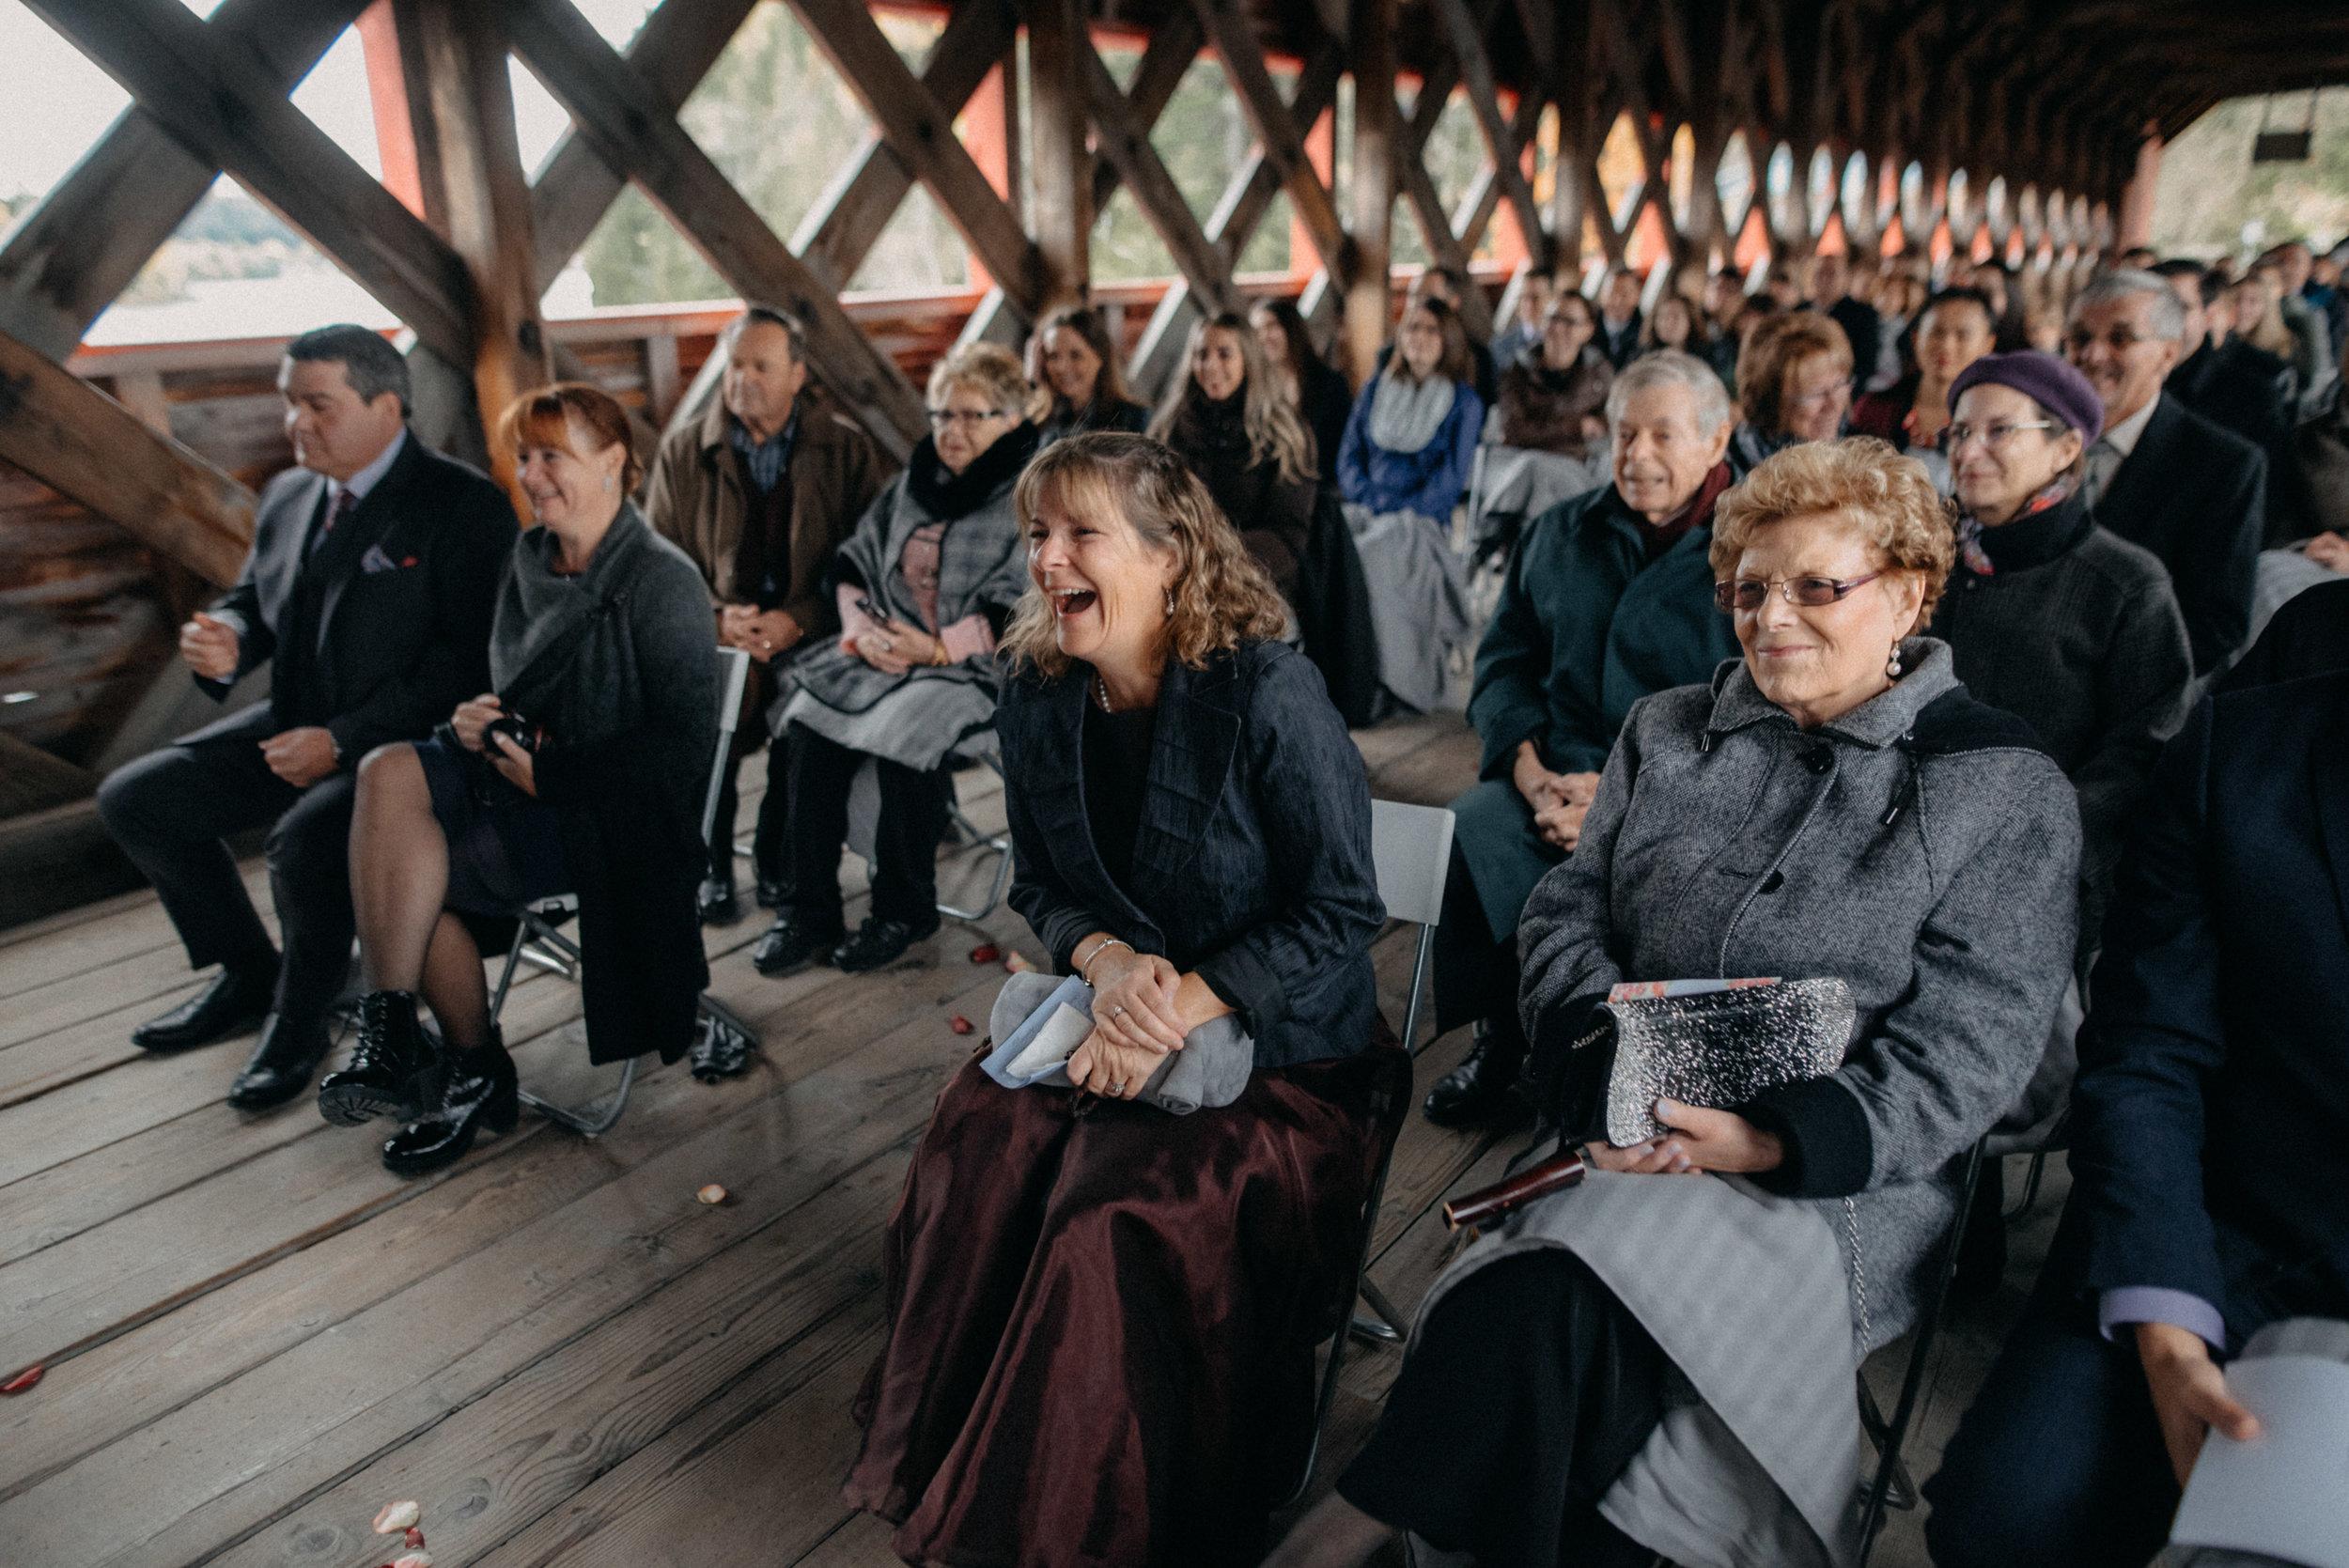 photographe_gatineau_mariage_ottawa_photographer_wedding_natasha_liard_photo_documentary_candid_lifestyle_wakefield_mill_red_bridge (30).jpg